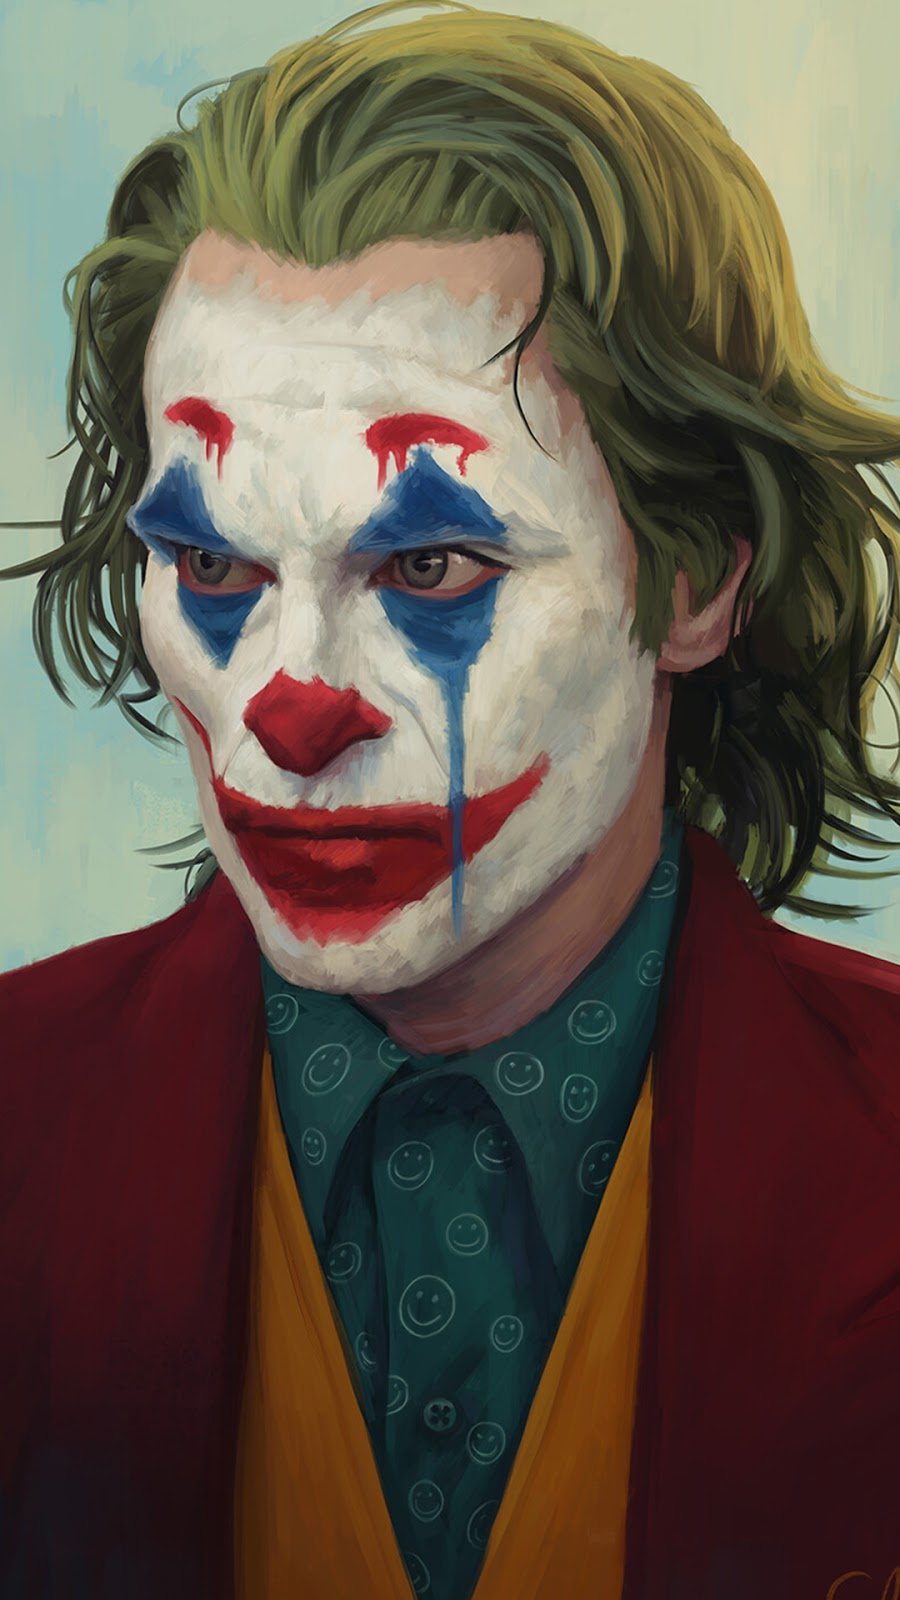 Joker Wallpaper 2019 Cool Wallpapers Heroscreen Cc